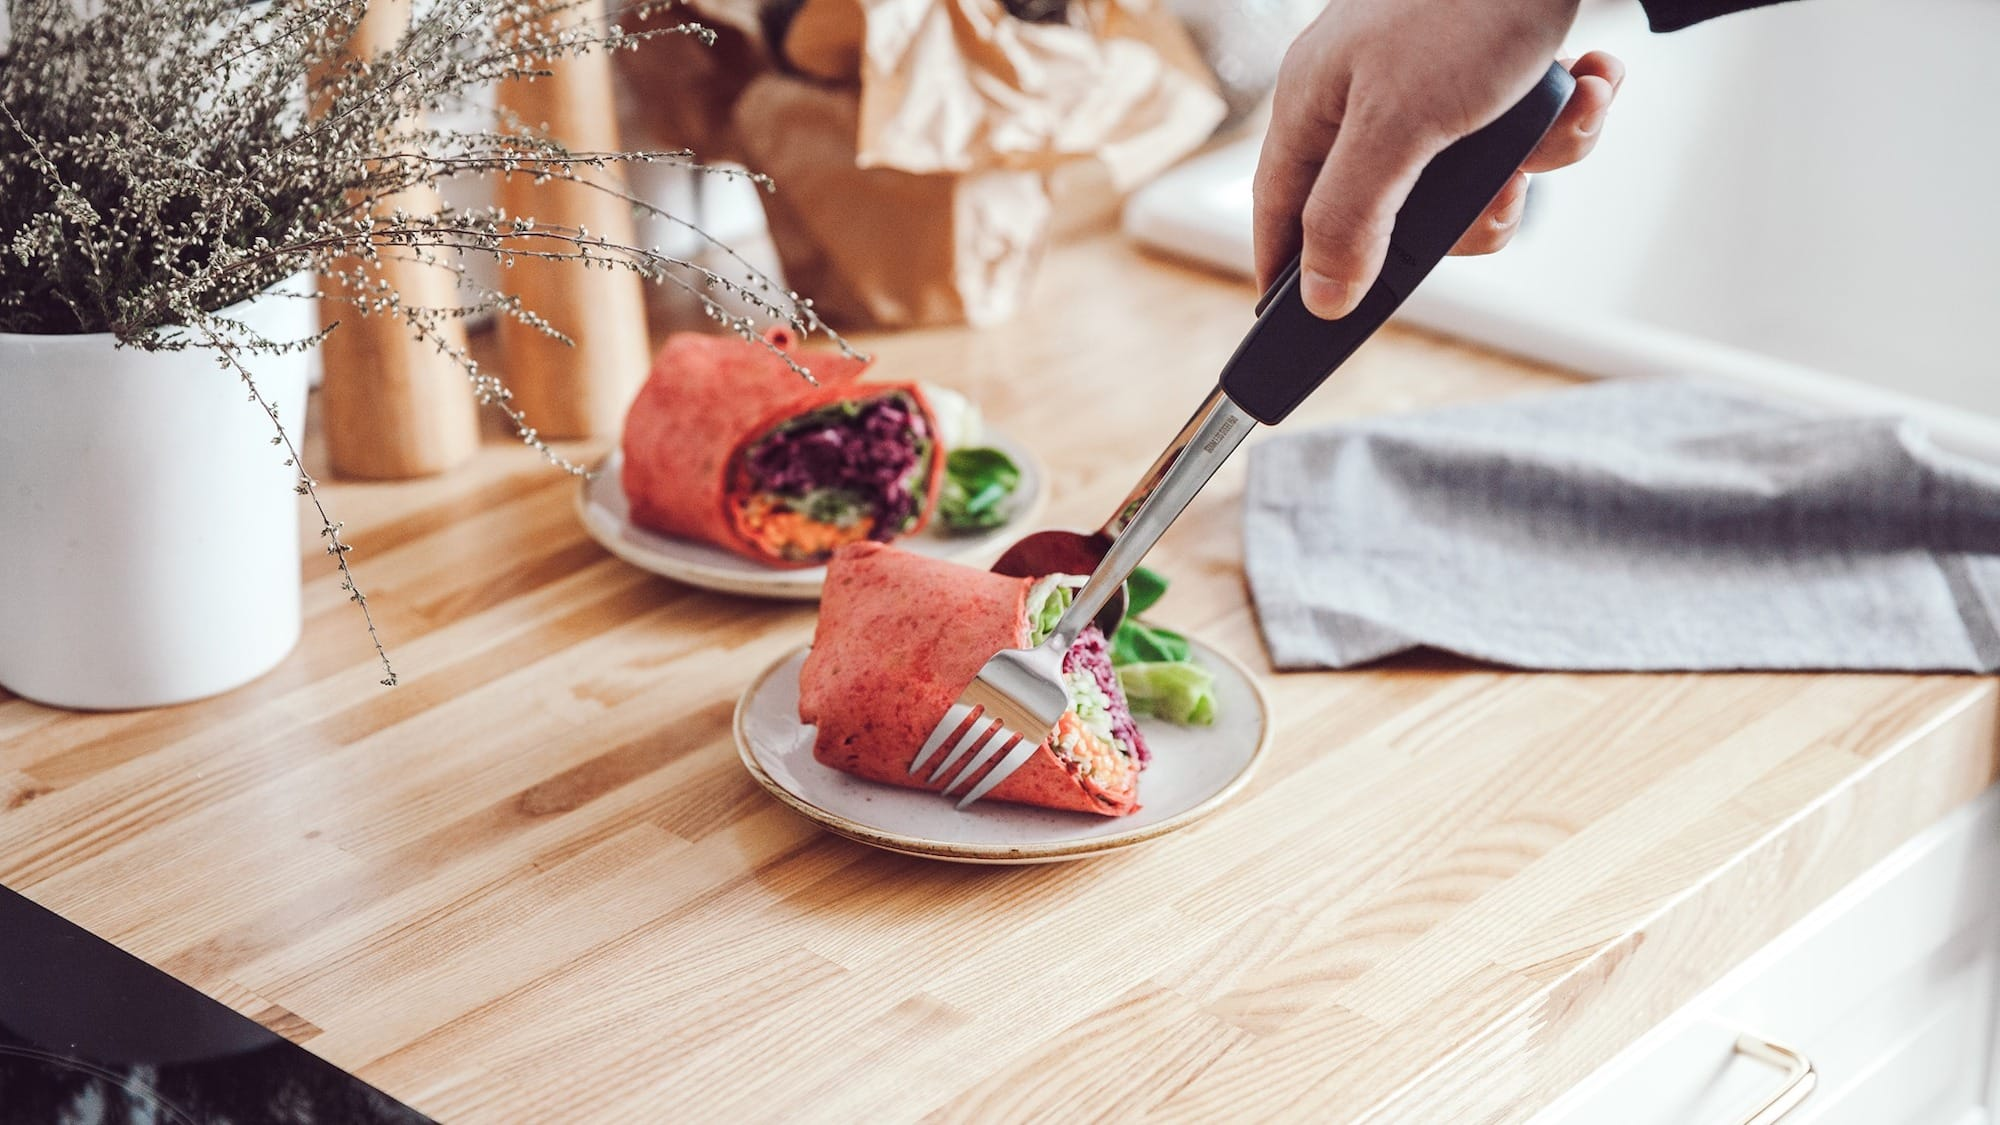 Anytongs flatware converter turns normal utensils into tongs